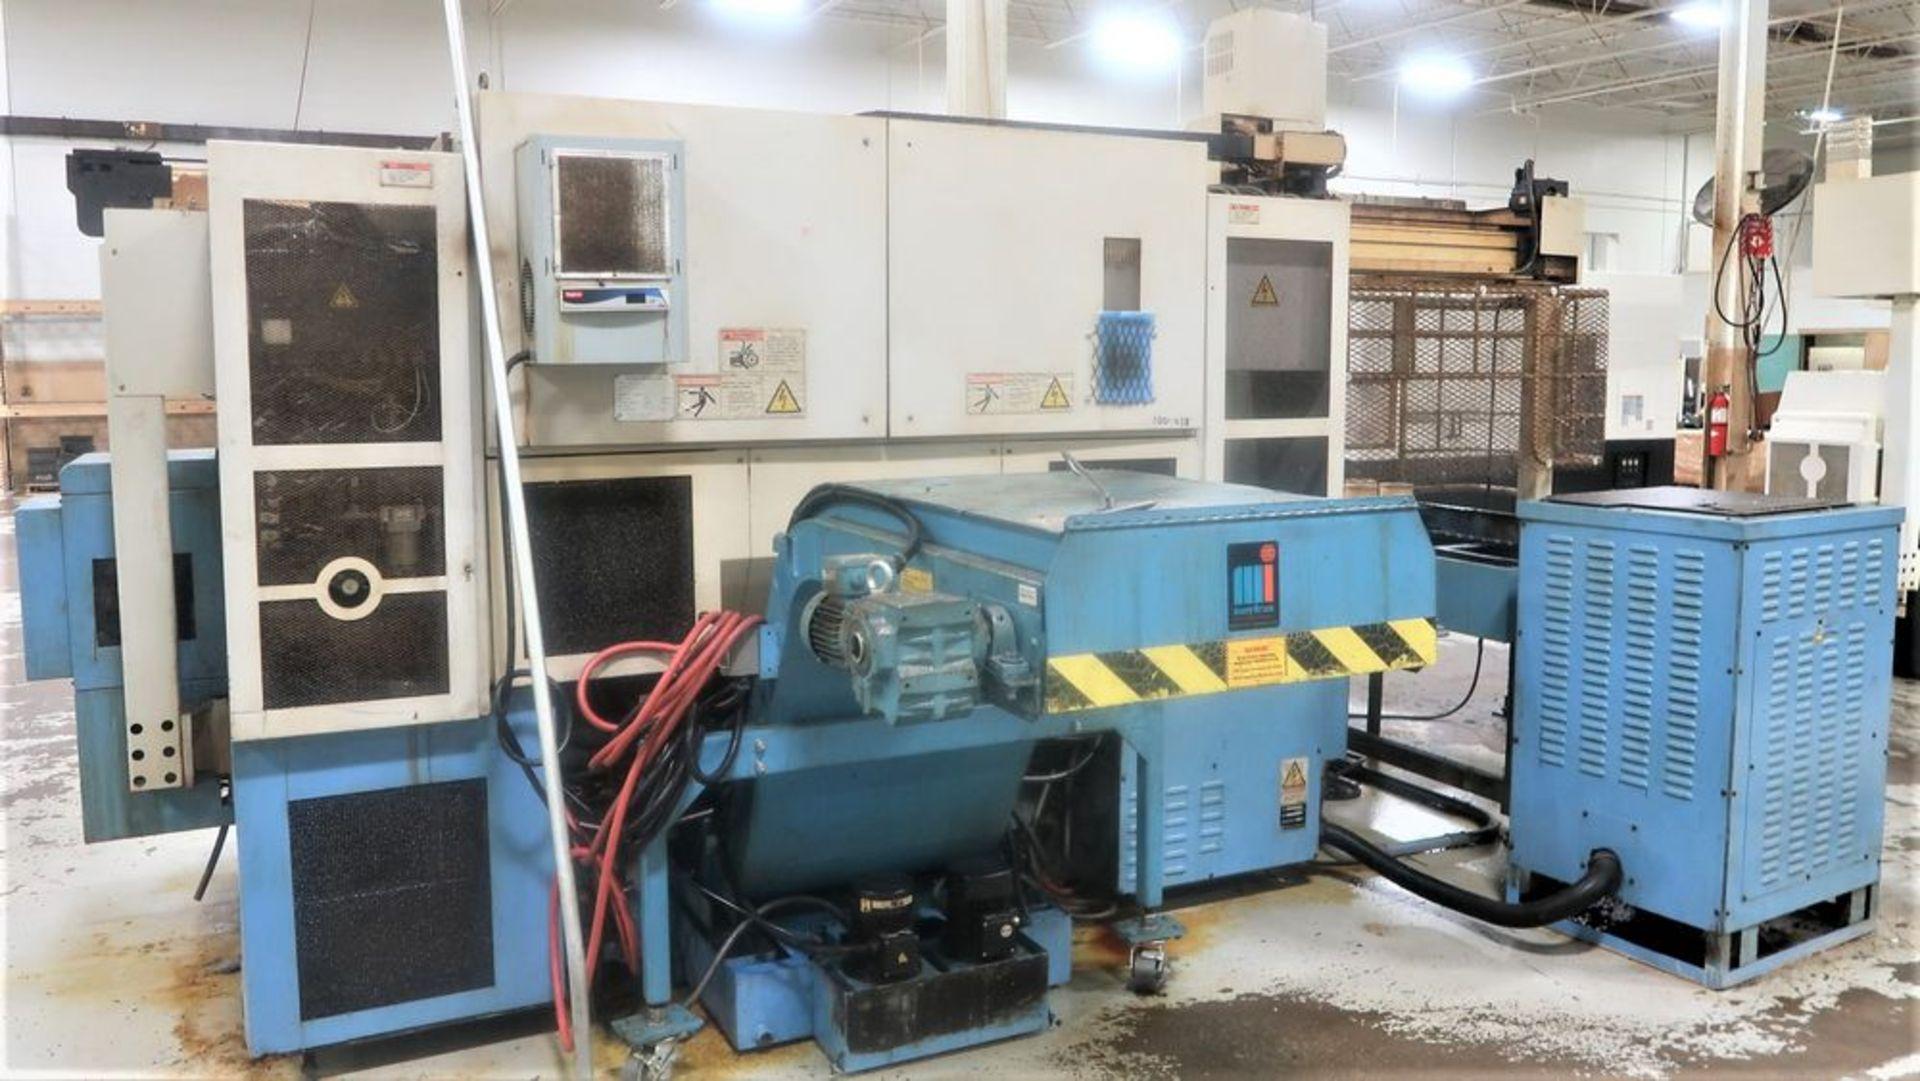 Mazak Dual Turn 25 Twin Spindle CNC Turning Center lathe, S/N 150888 - Image 11 of 13